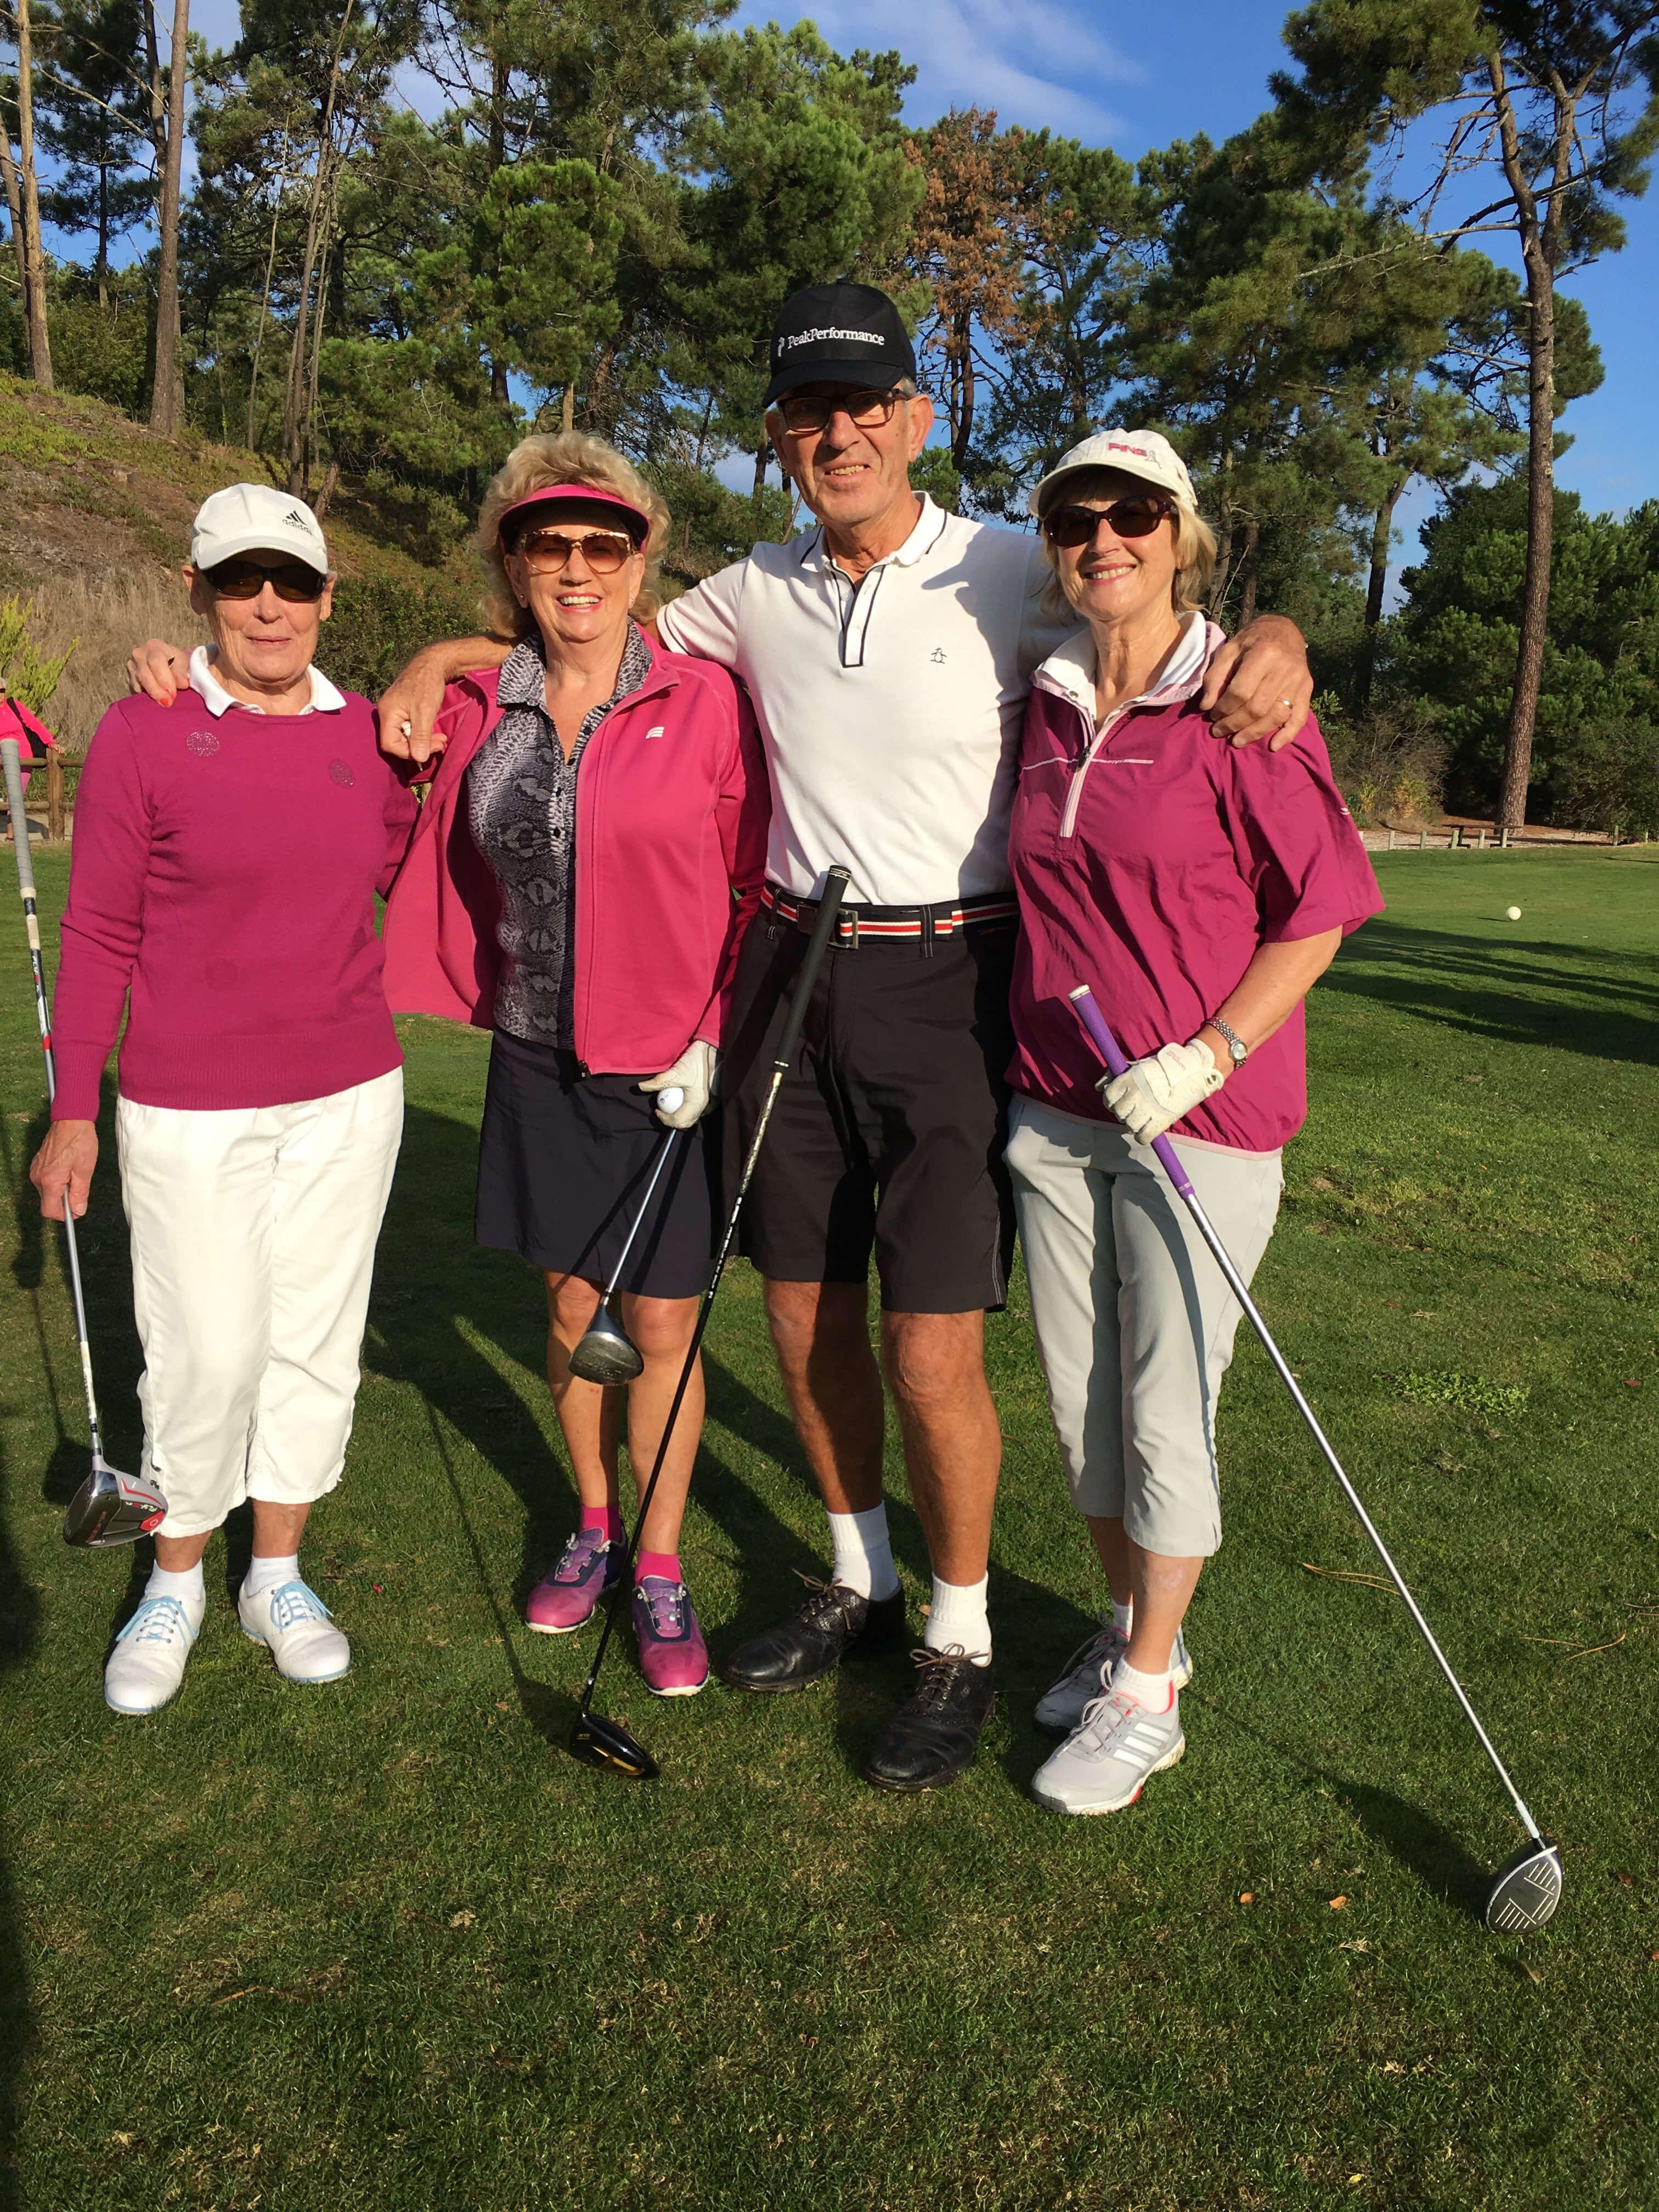 Golf nu trivs lotta igen